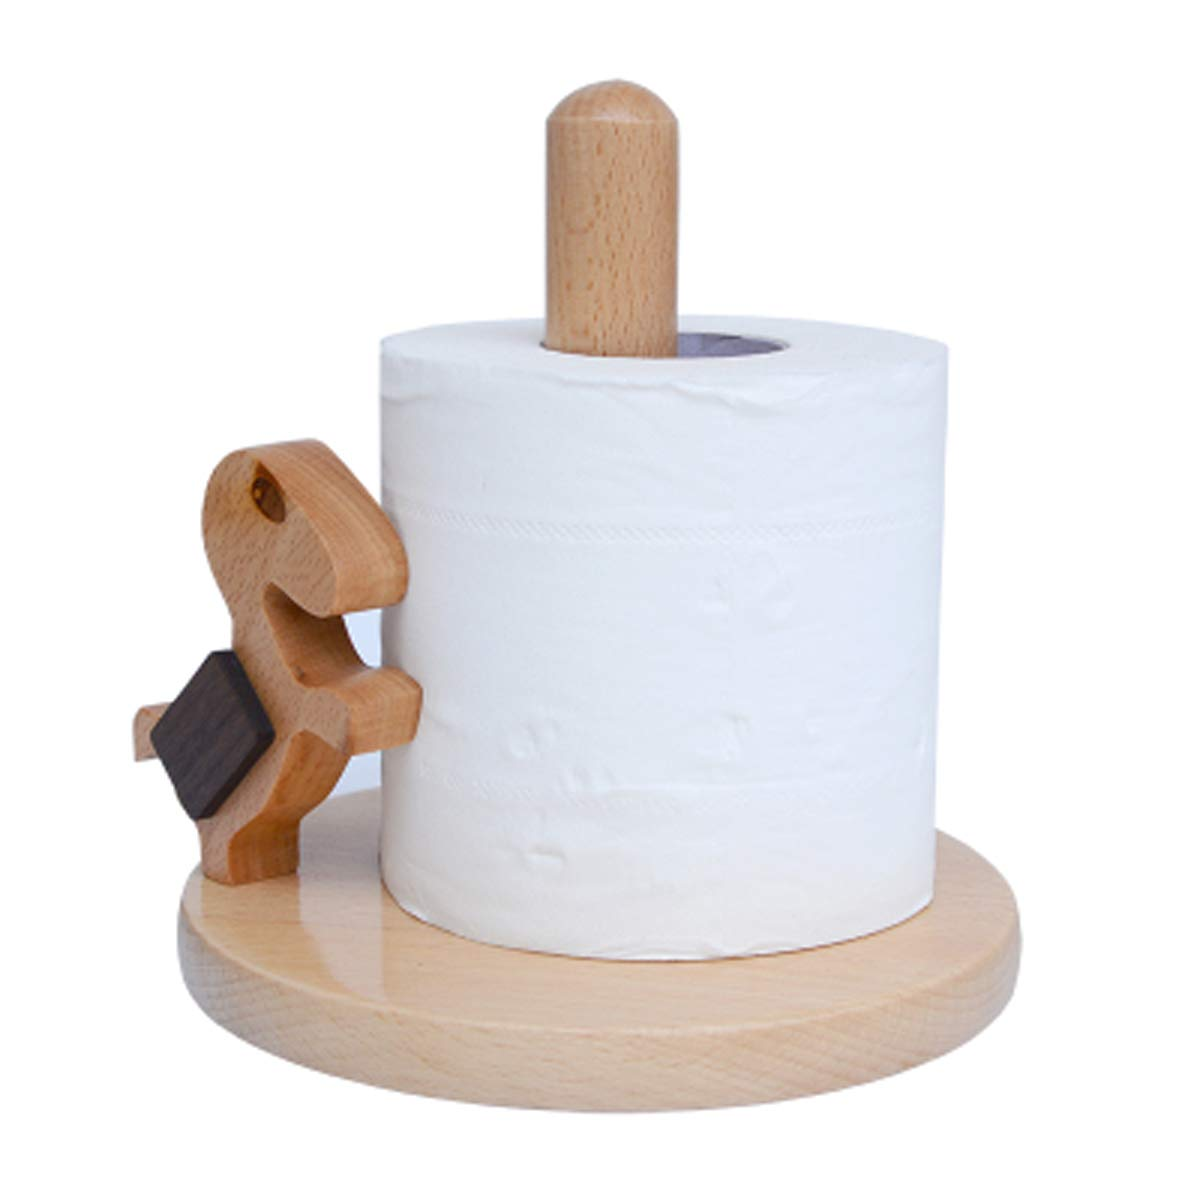 Q&F Toilet Paper Holder Home Solid Wooden Tissue Holder,Waterproof,Non-slip,Desktop Storage Rack by Q&F (Image #1)